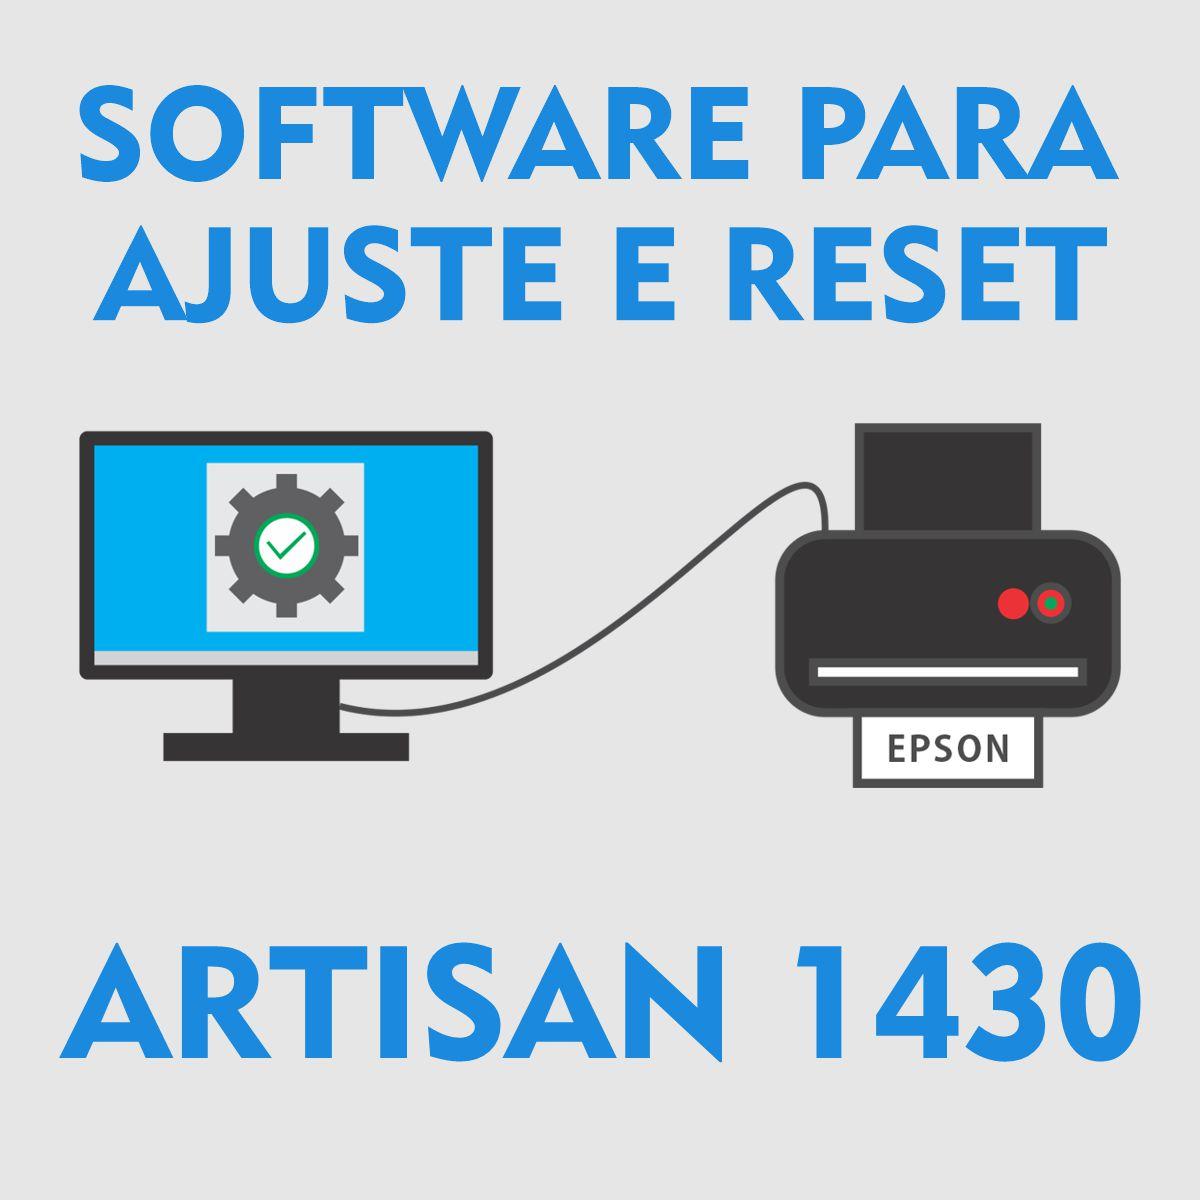 Epson Artisan 1430 | Software para Ajustes e Reset das Almofadas